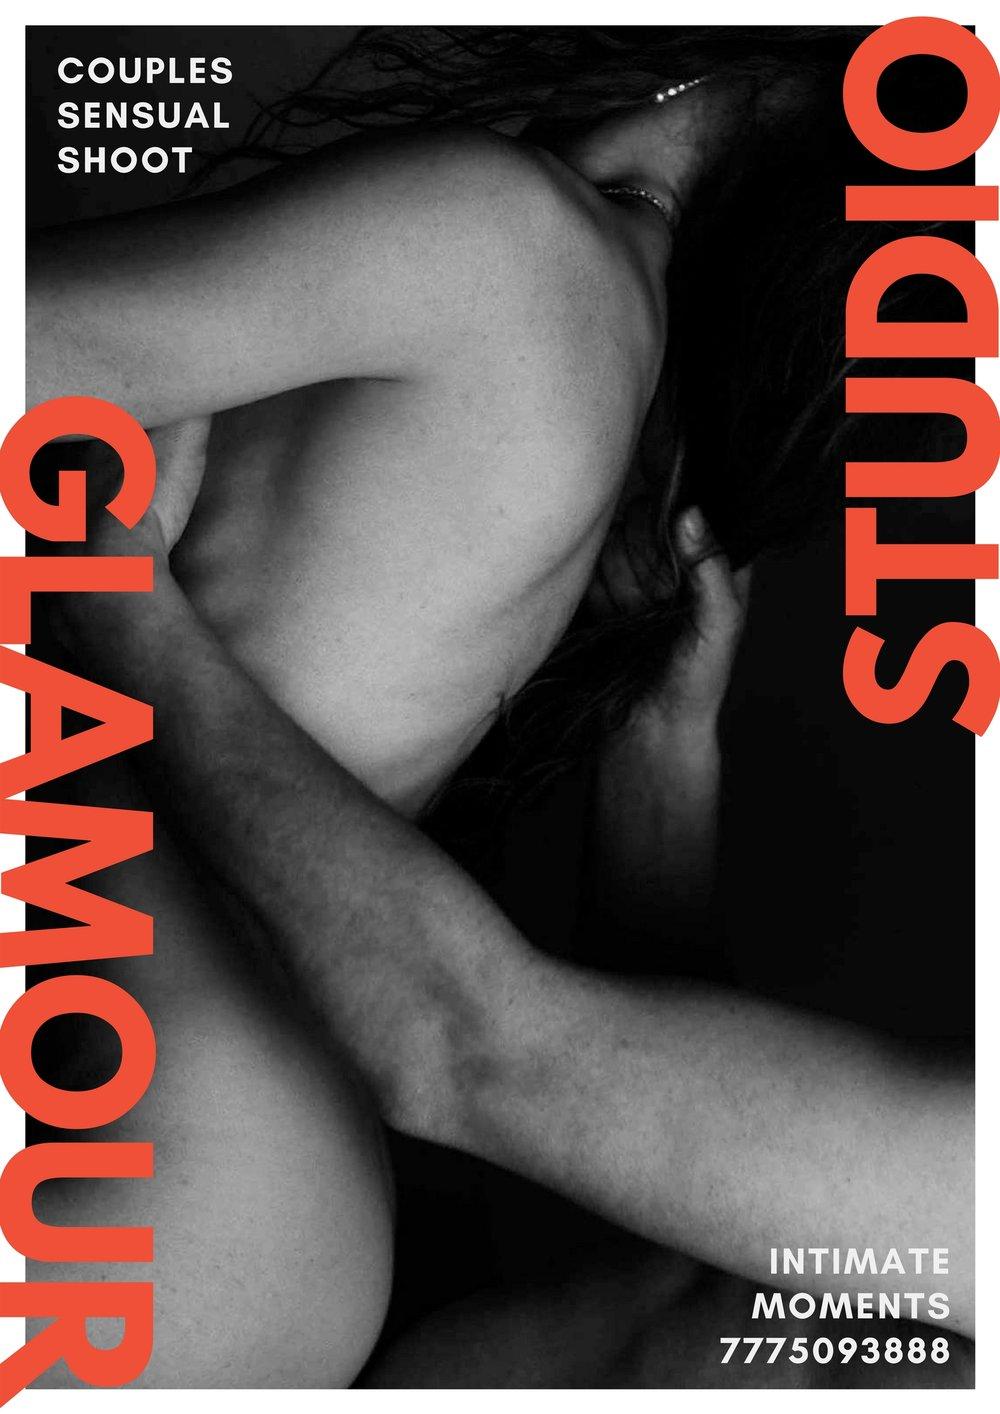 23juliawinterstudiolondon2018studioglamour couples boudoir photoshoot london.jpg